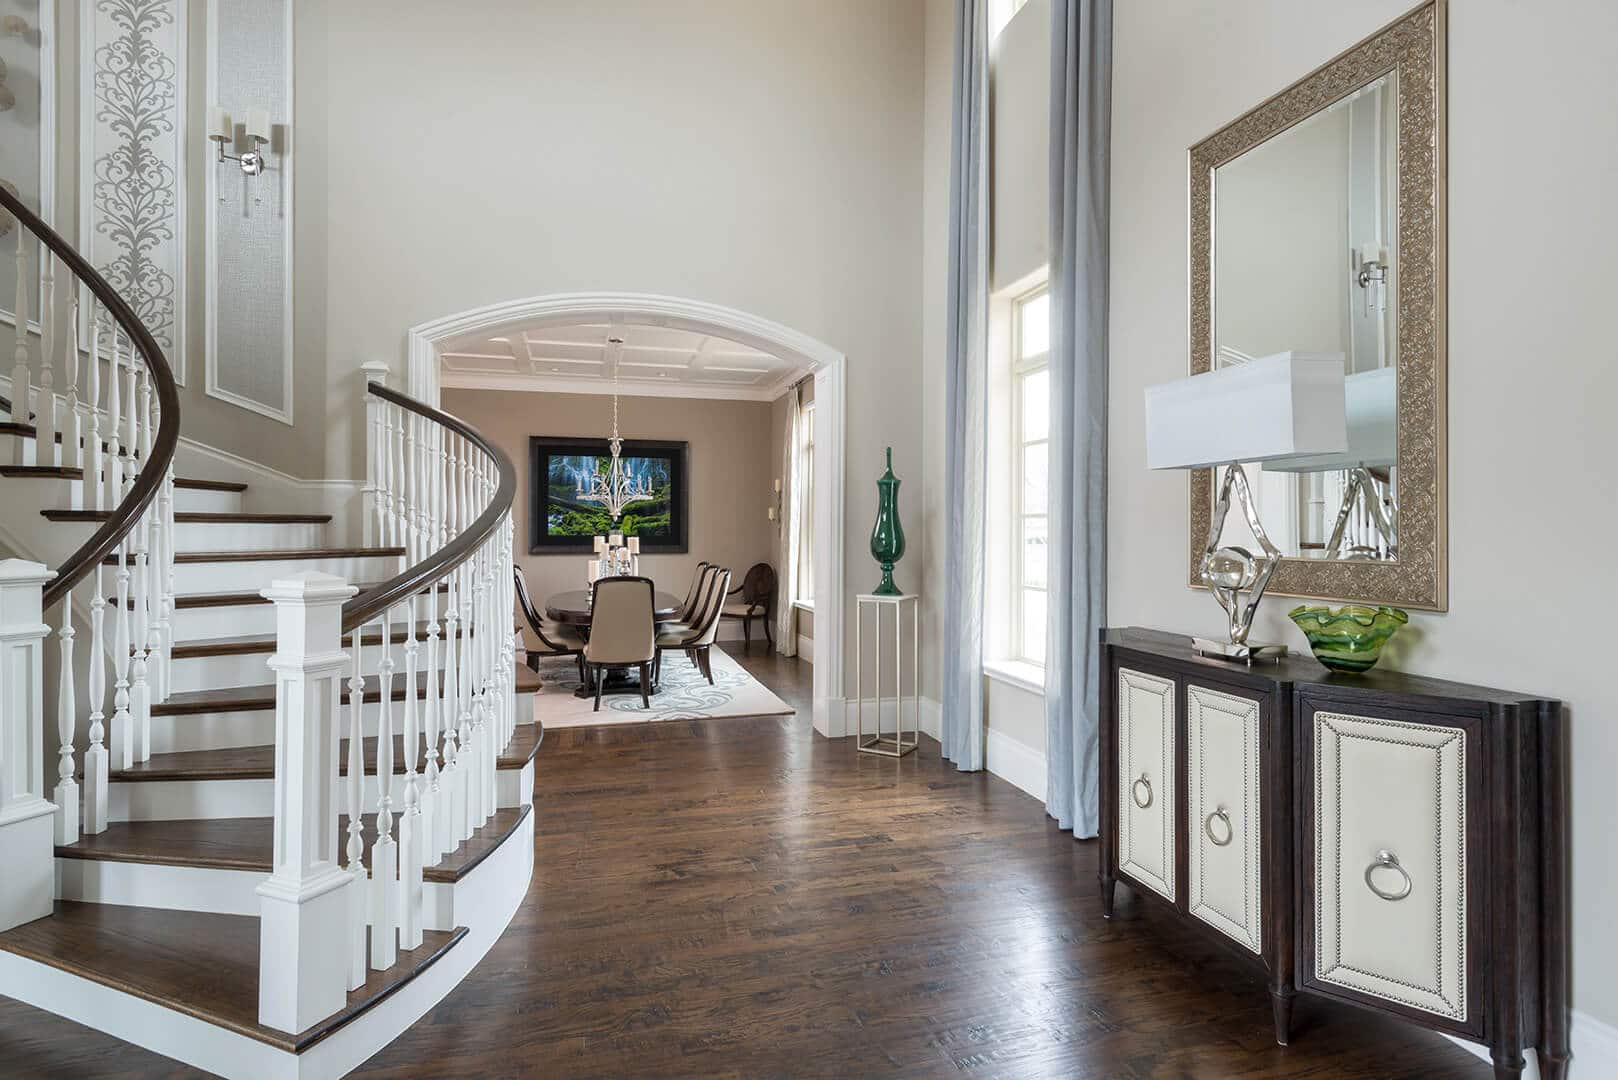 Neutral Foyer Decorating Ideas | Dallas Interior Designer by Dee Frazier Interiors Decorating Den Interiors the best Dallas Interior Designer